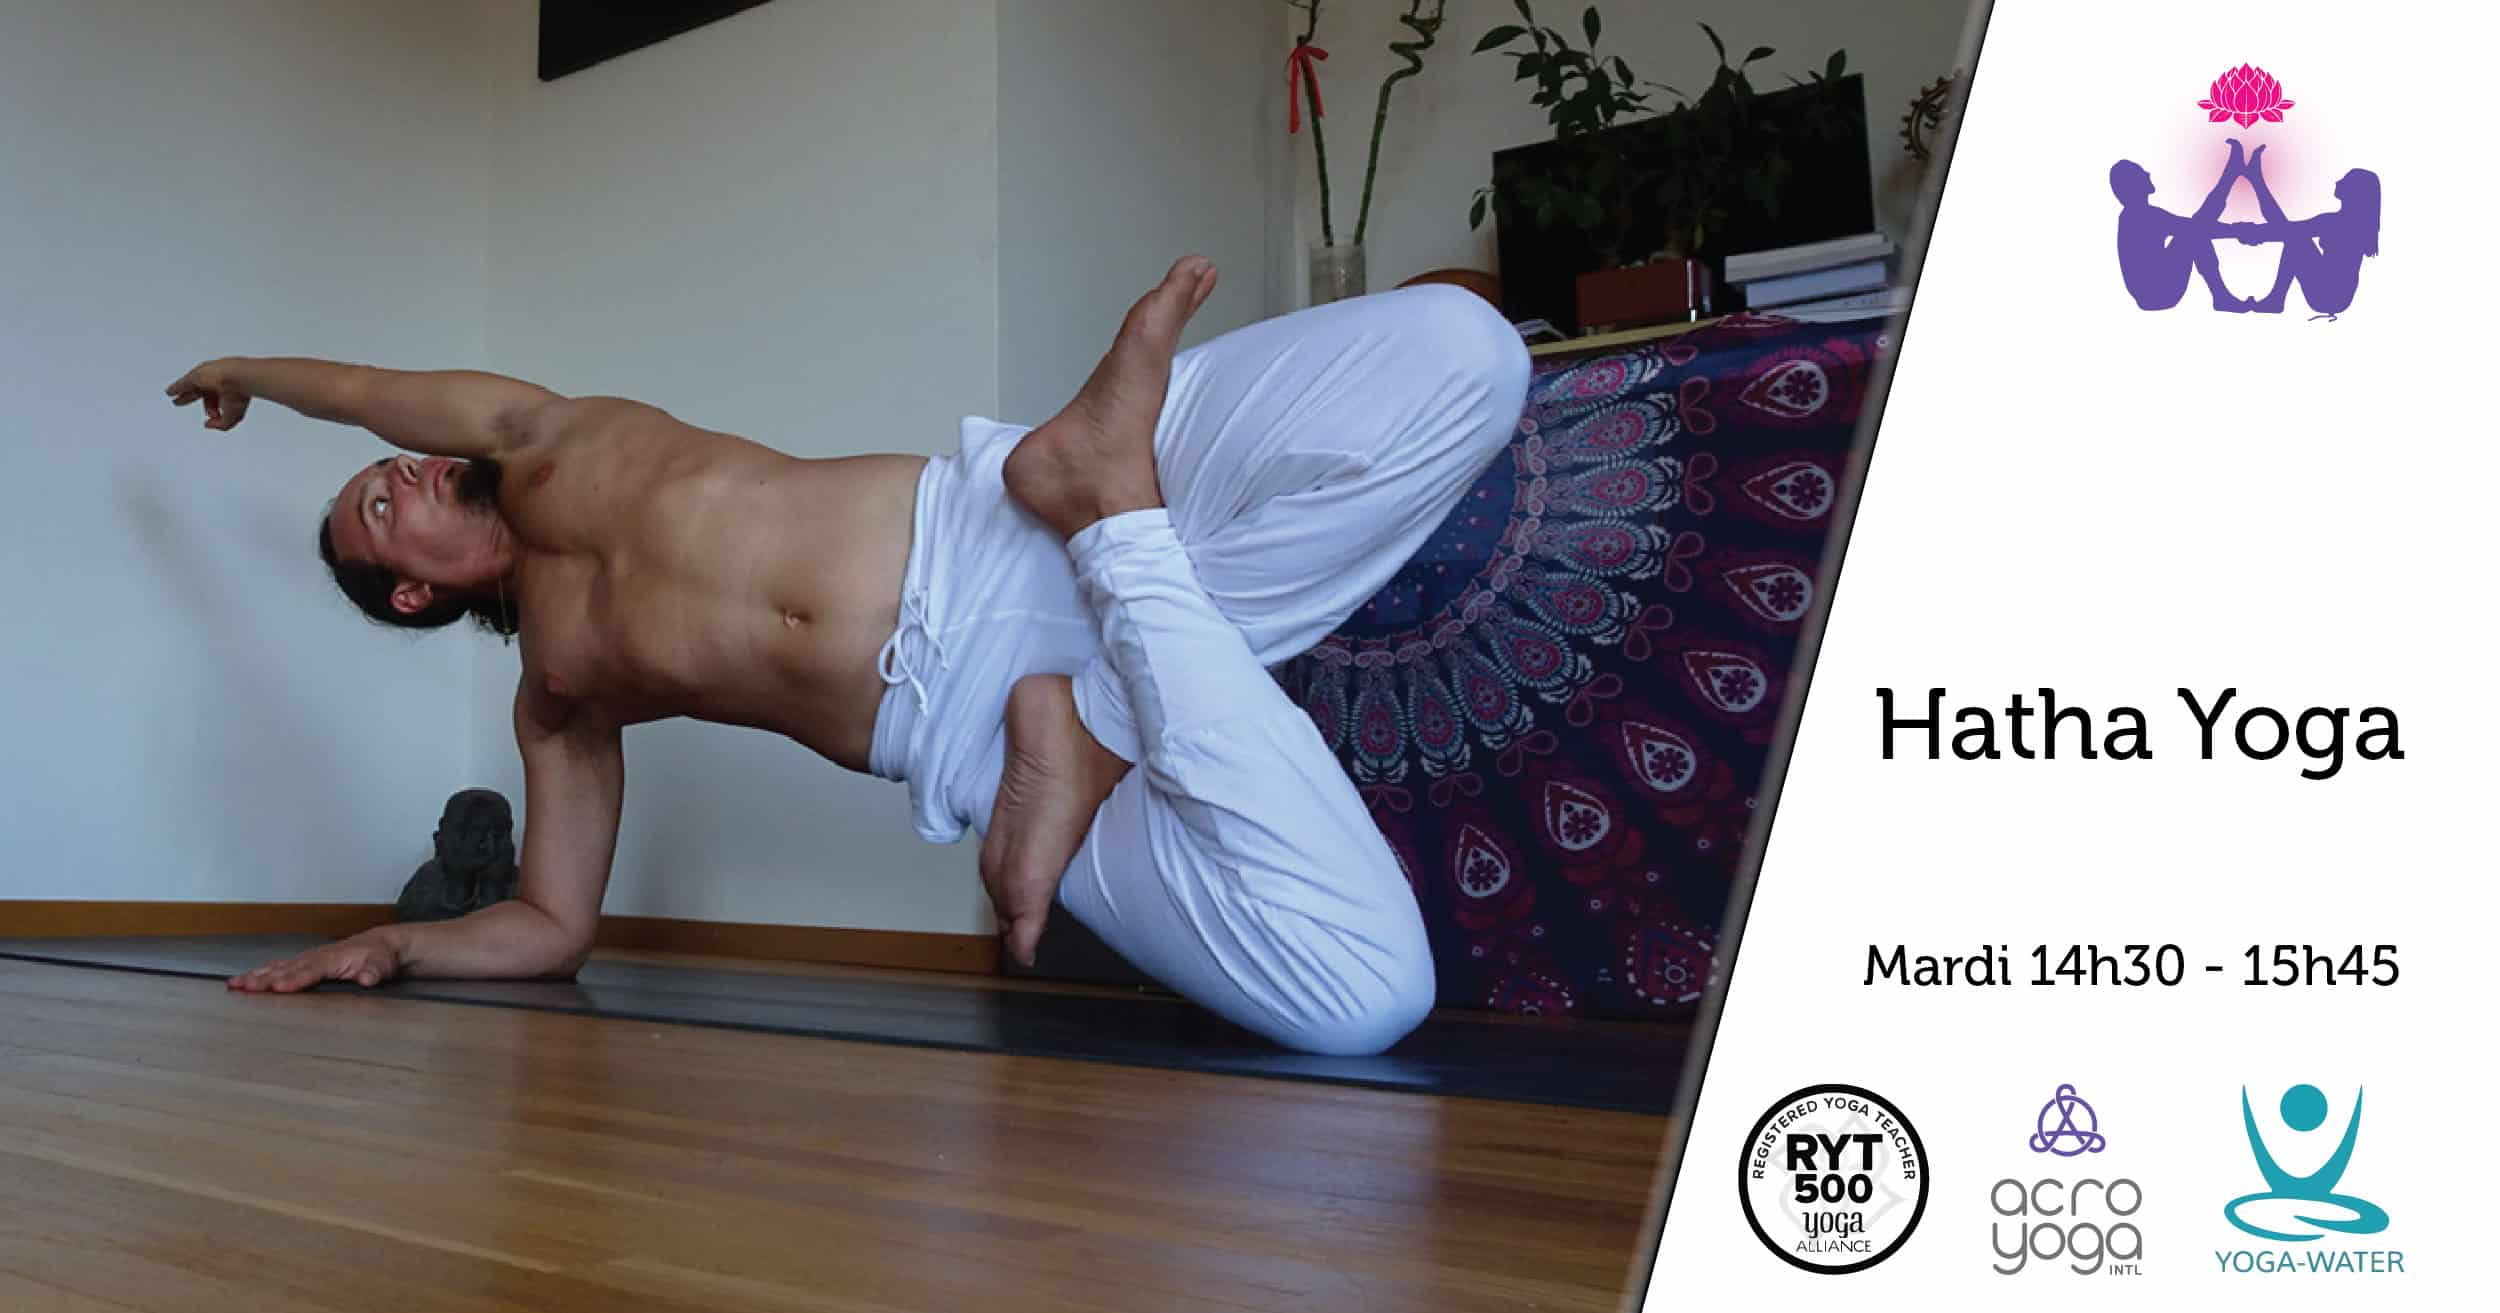 Hatha Yoga cours du mardi